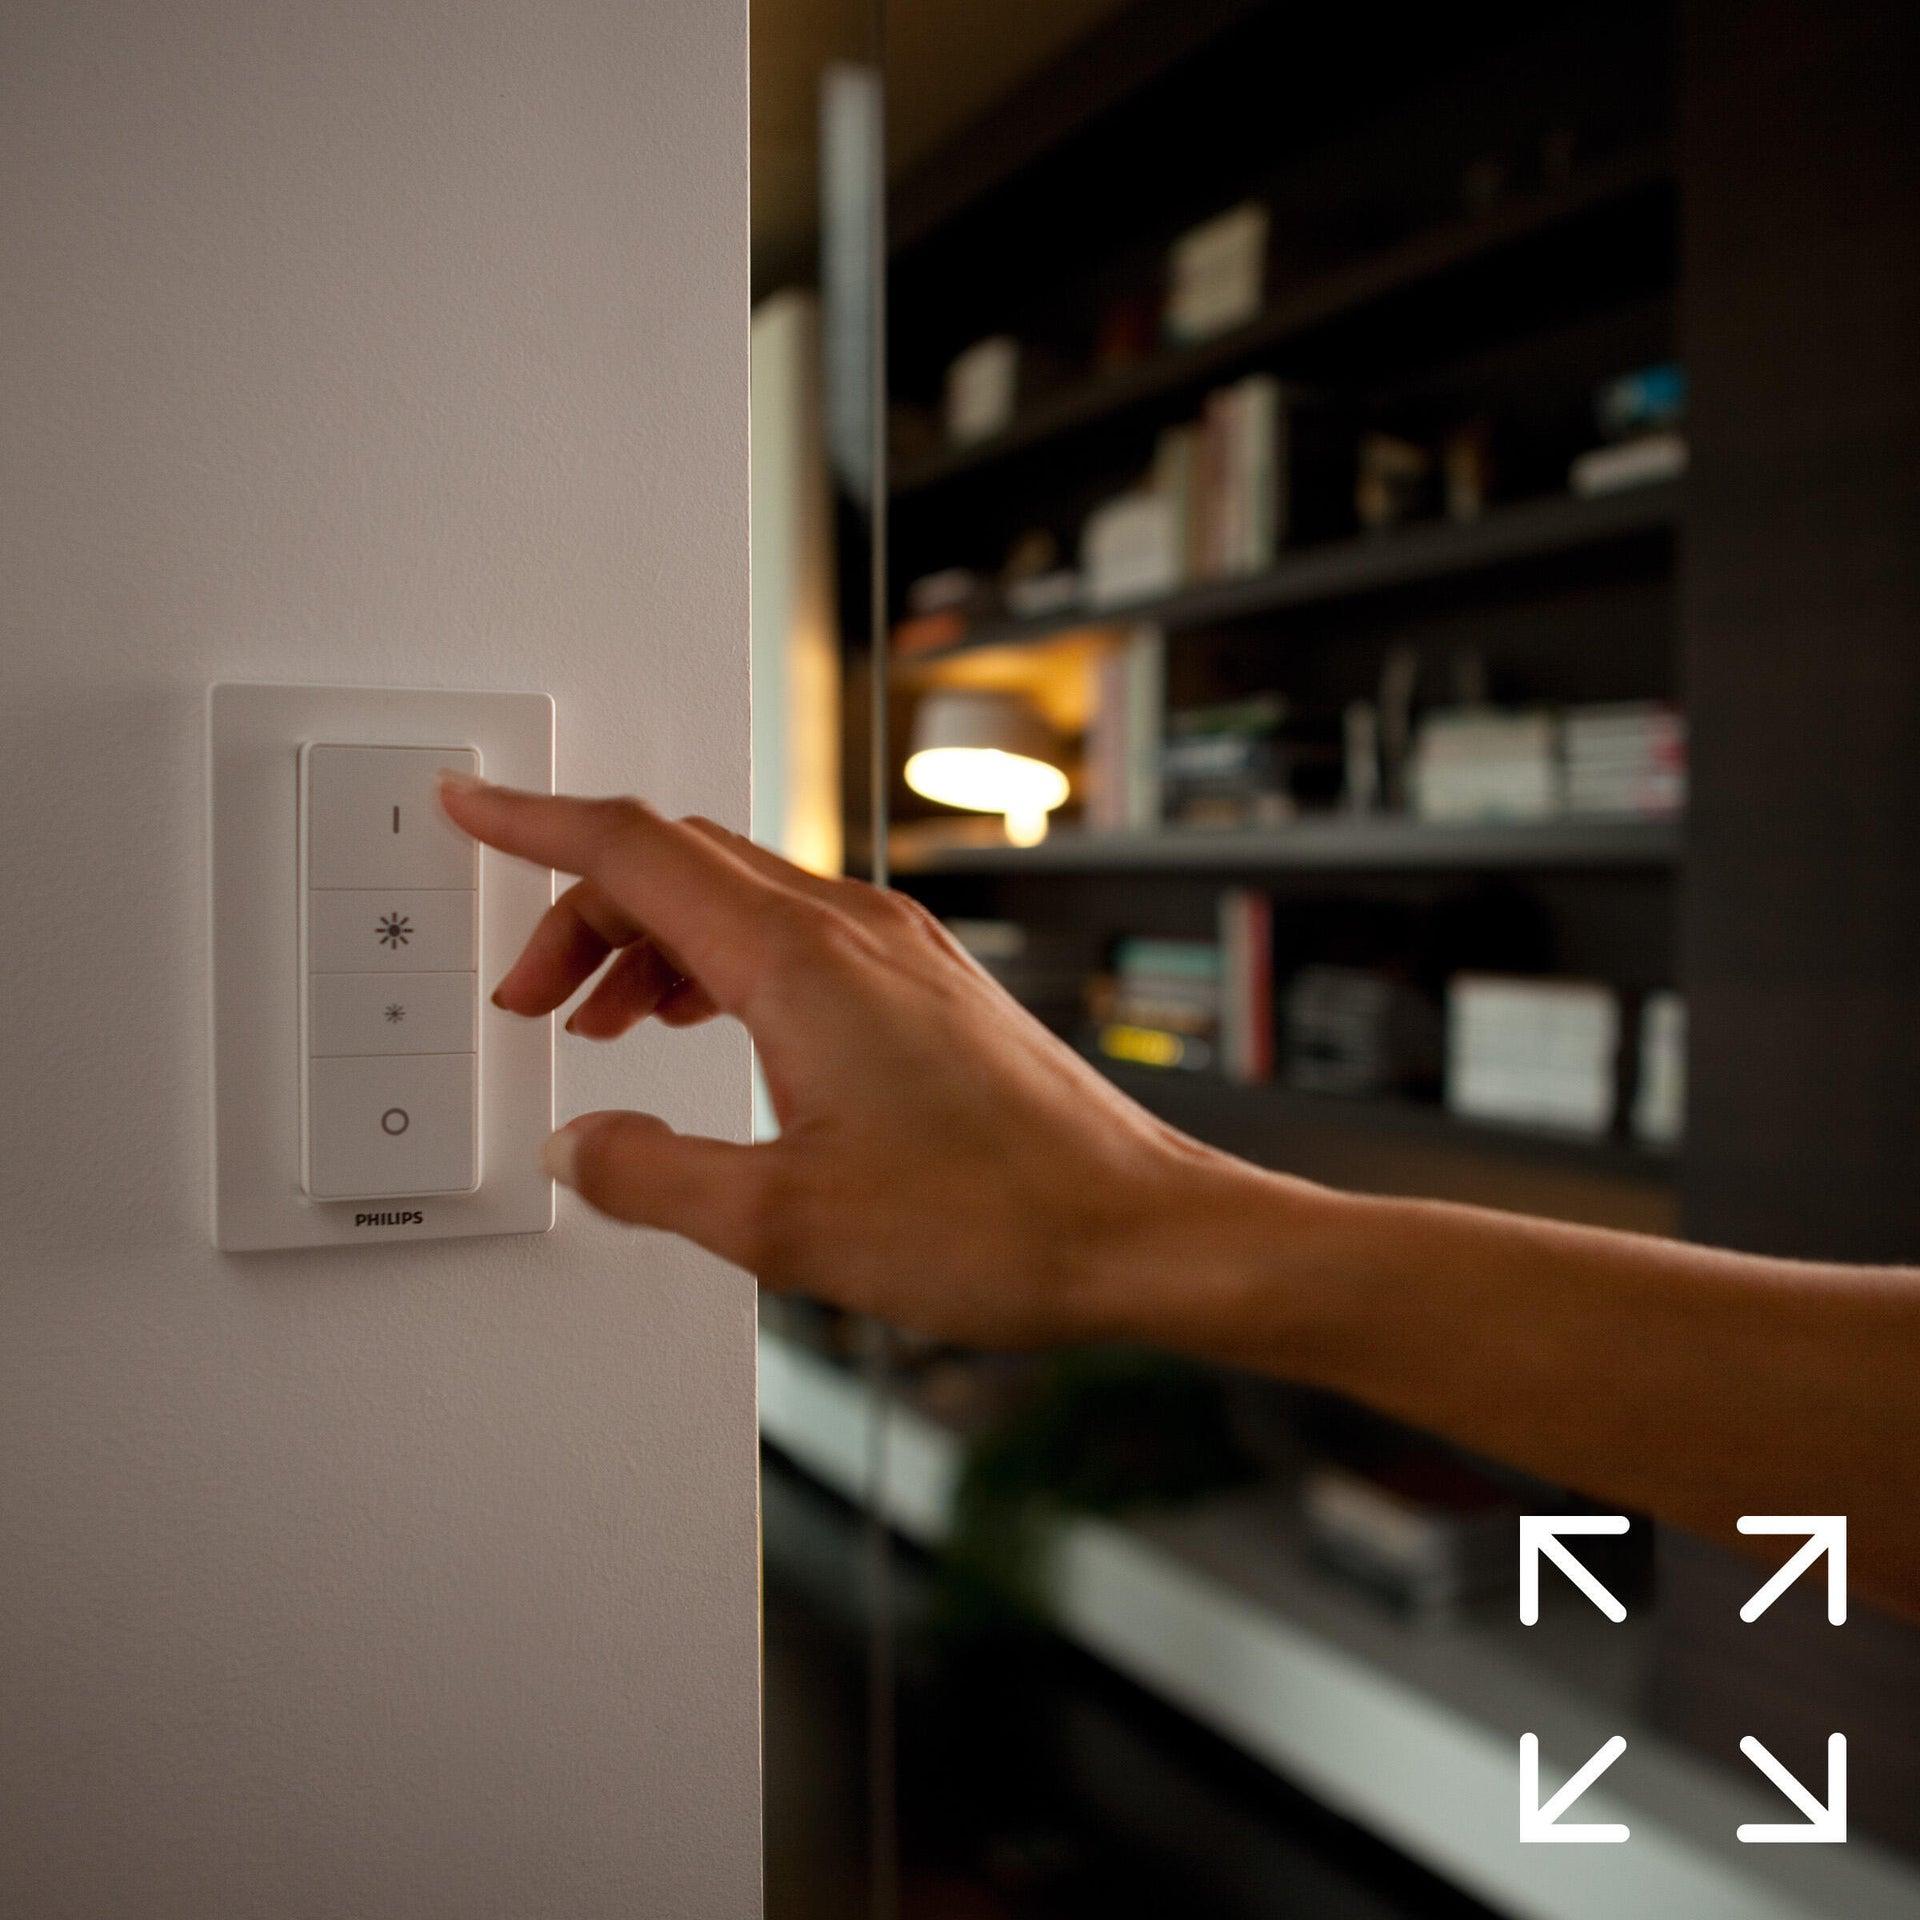 Telecomando PHILIPS HUE per lampadina - 7